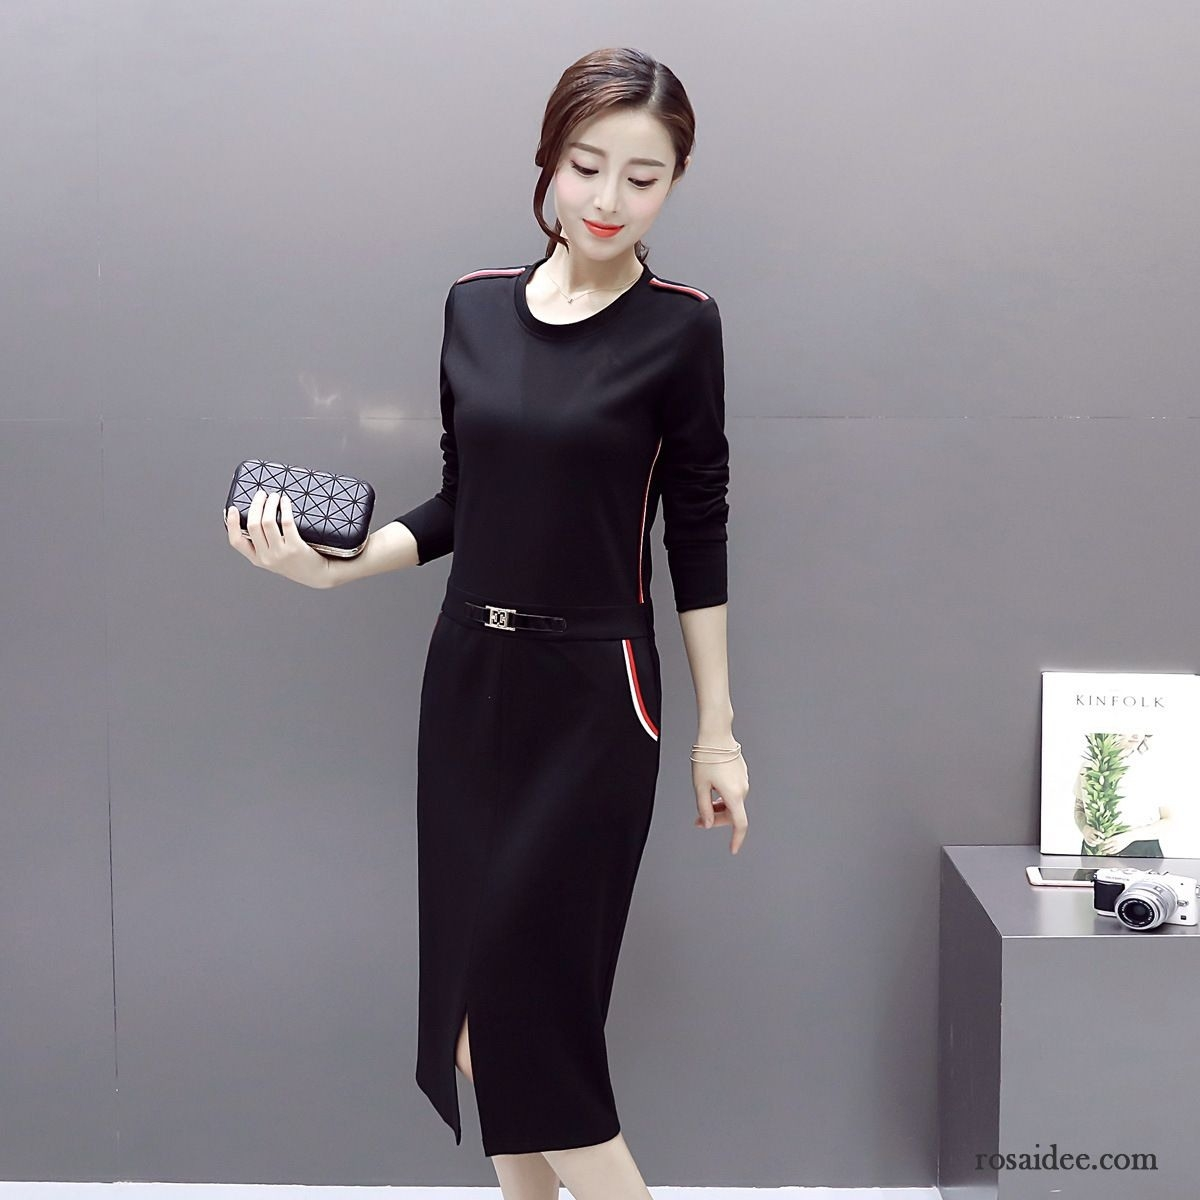 15 Genial Damen Kleider Langarm BoutiqueDesigner Wunderbar Damen Kleider Langarm Vertrieb